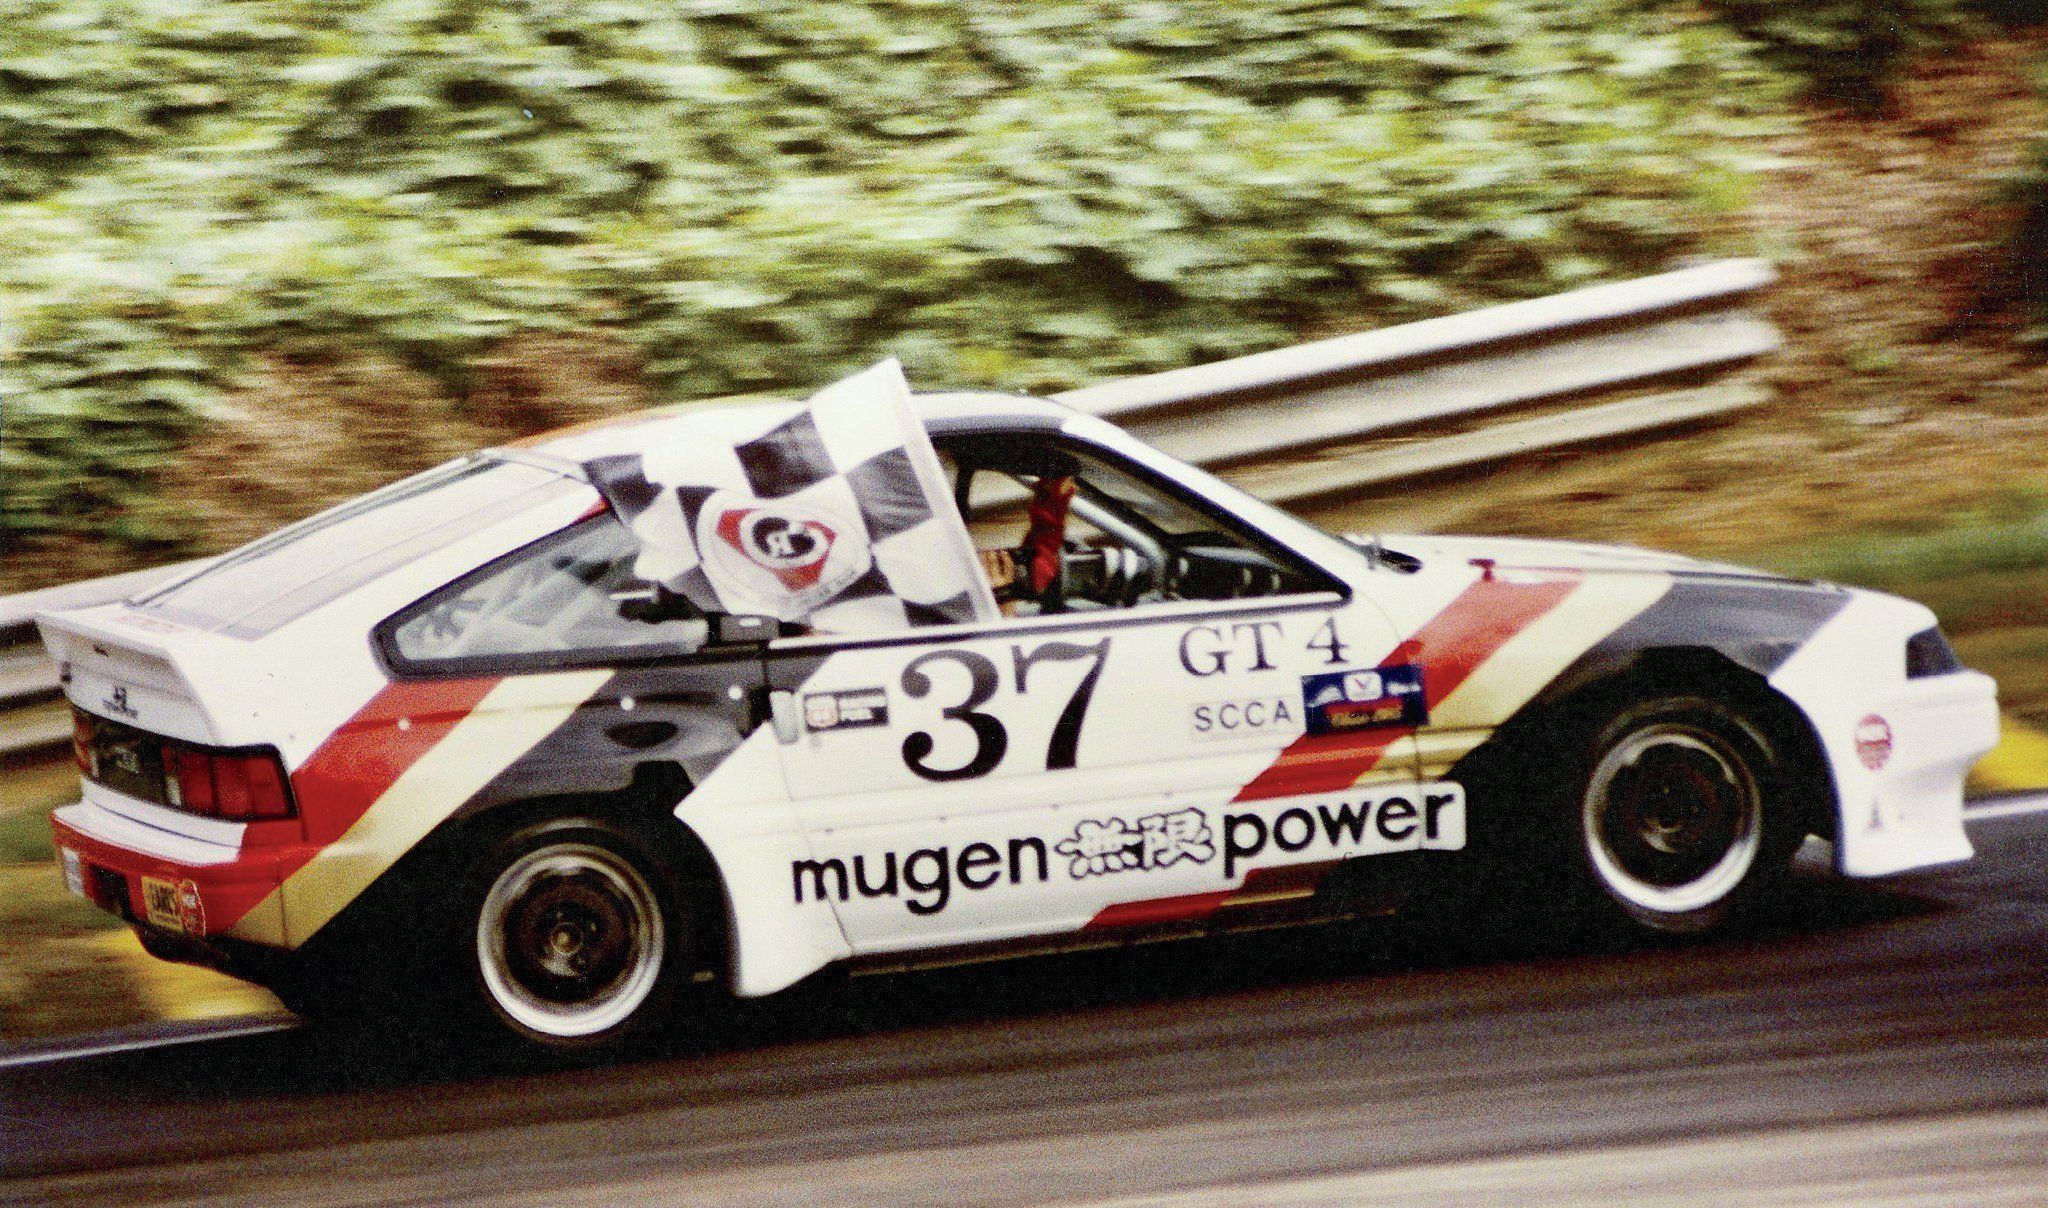 17th 1984 HONDA CR-X/MUGEN GT-4 (BY COMPTECH)